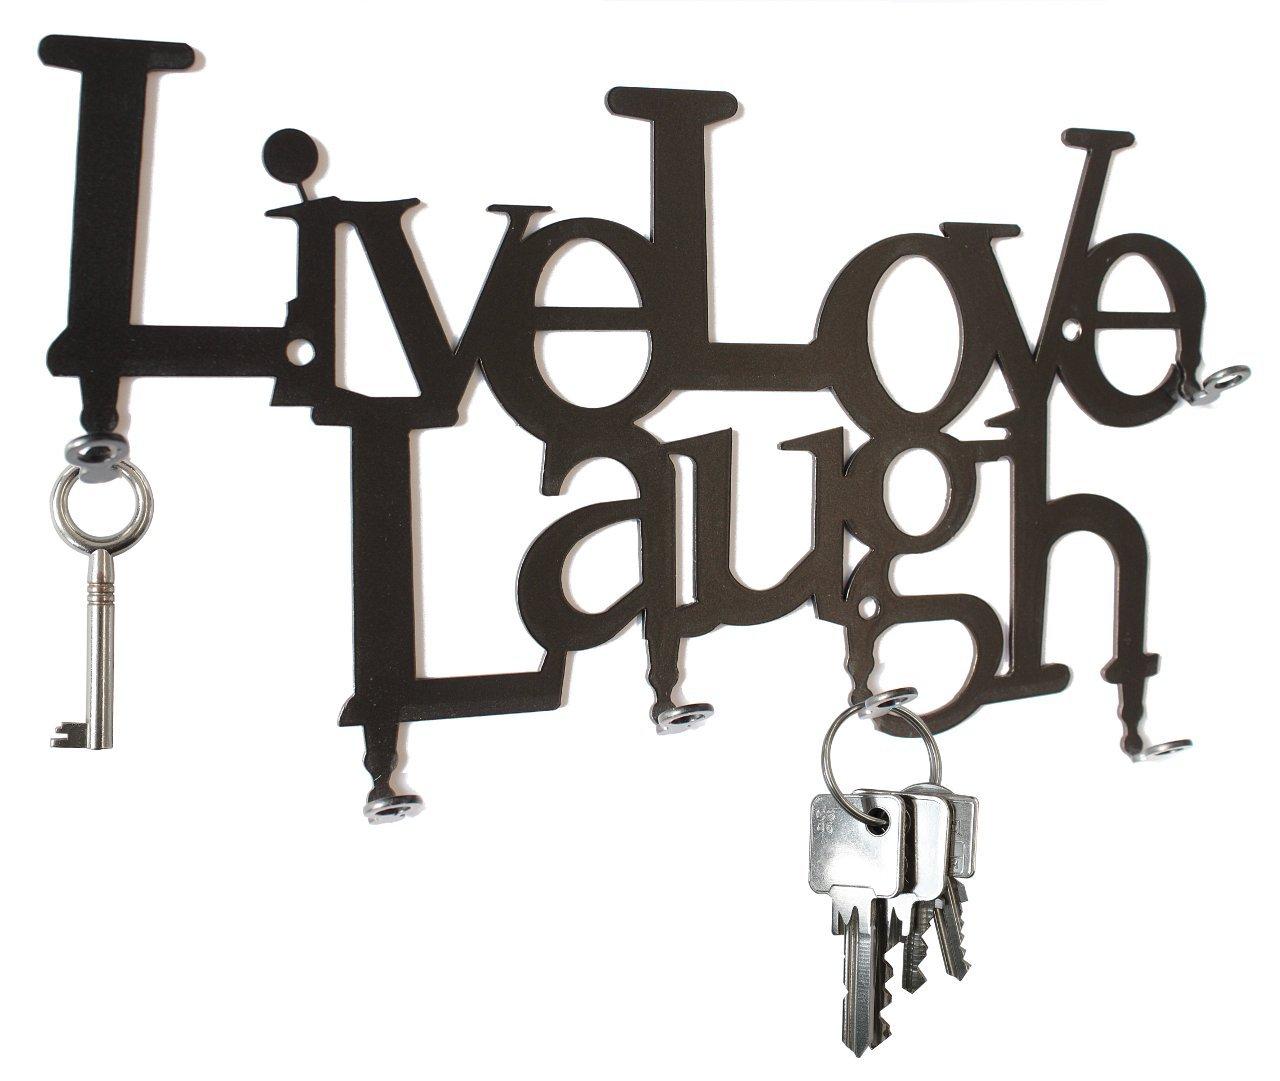 Live Love Laugh - Wall Key Hooks - Holder, Hanger Design steelprint.de SB30-0004-01